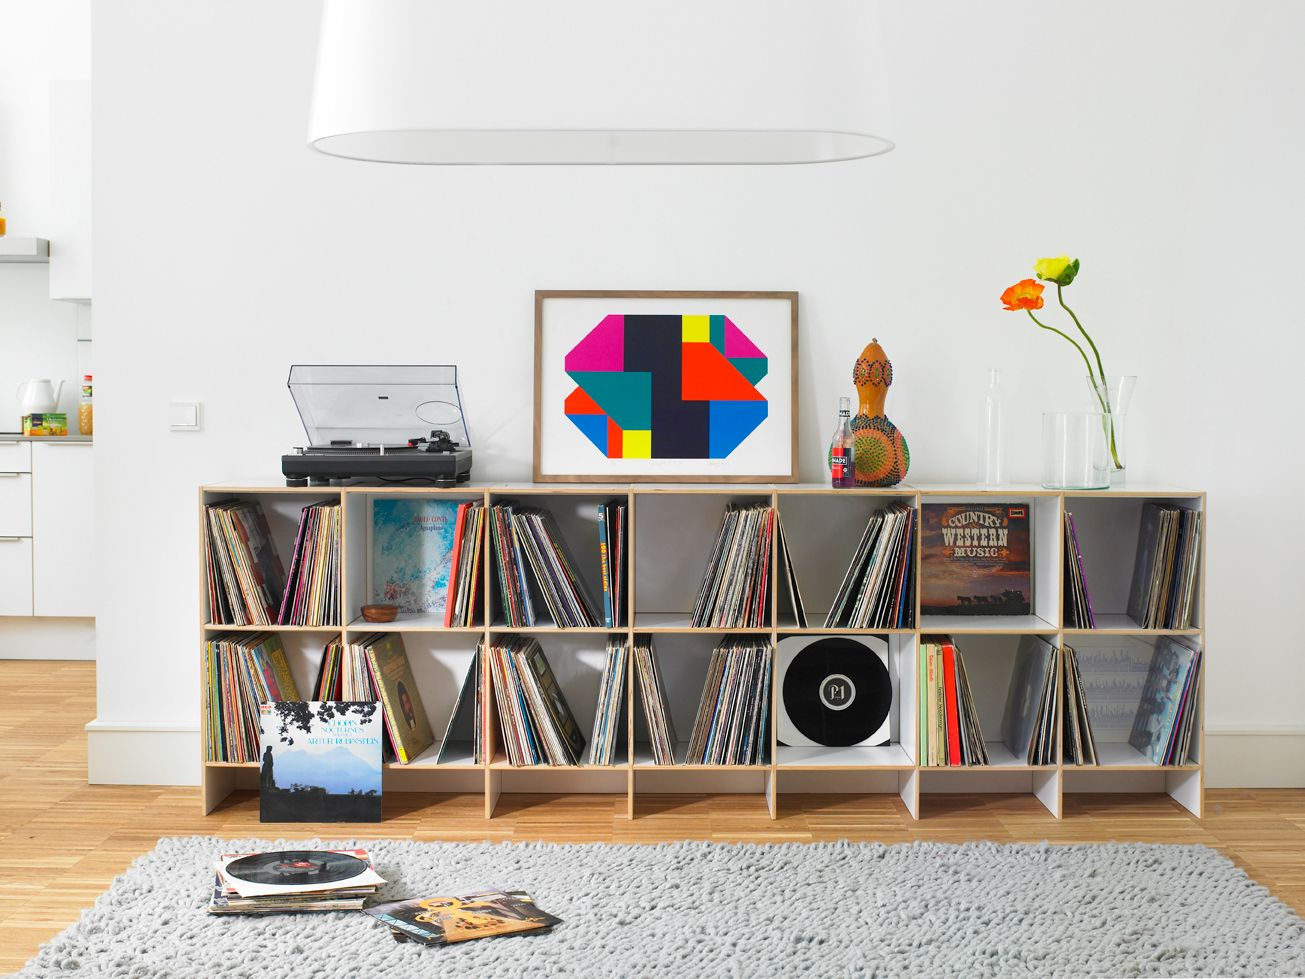 schallplattenregal als sideboard konzipiert - Schallplattenregal